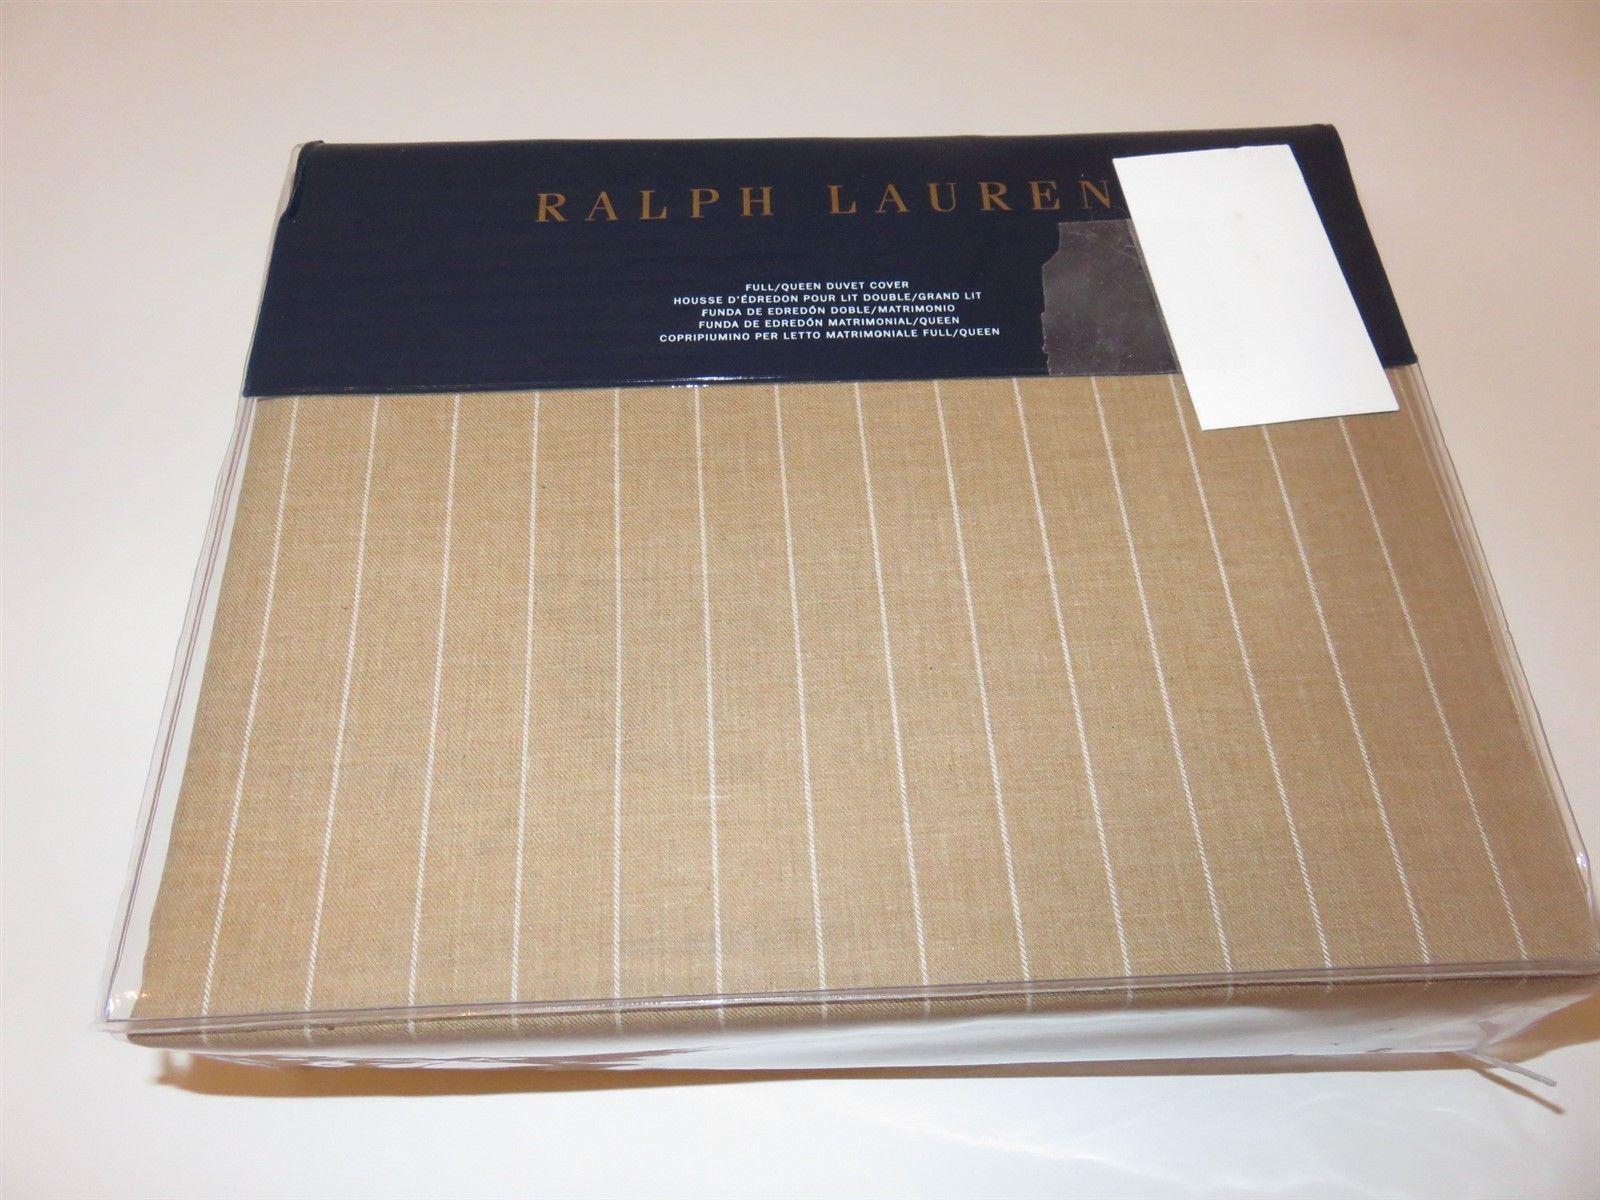 Copripiumino Tom E Jerry.Ralph Lauren Camel Haberdashery Camel Full And 50 Similar Items